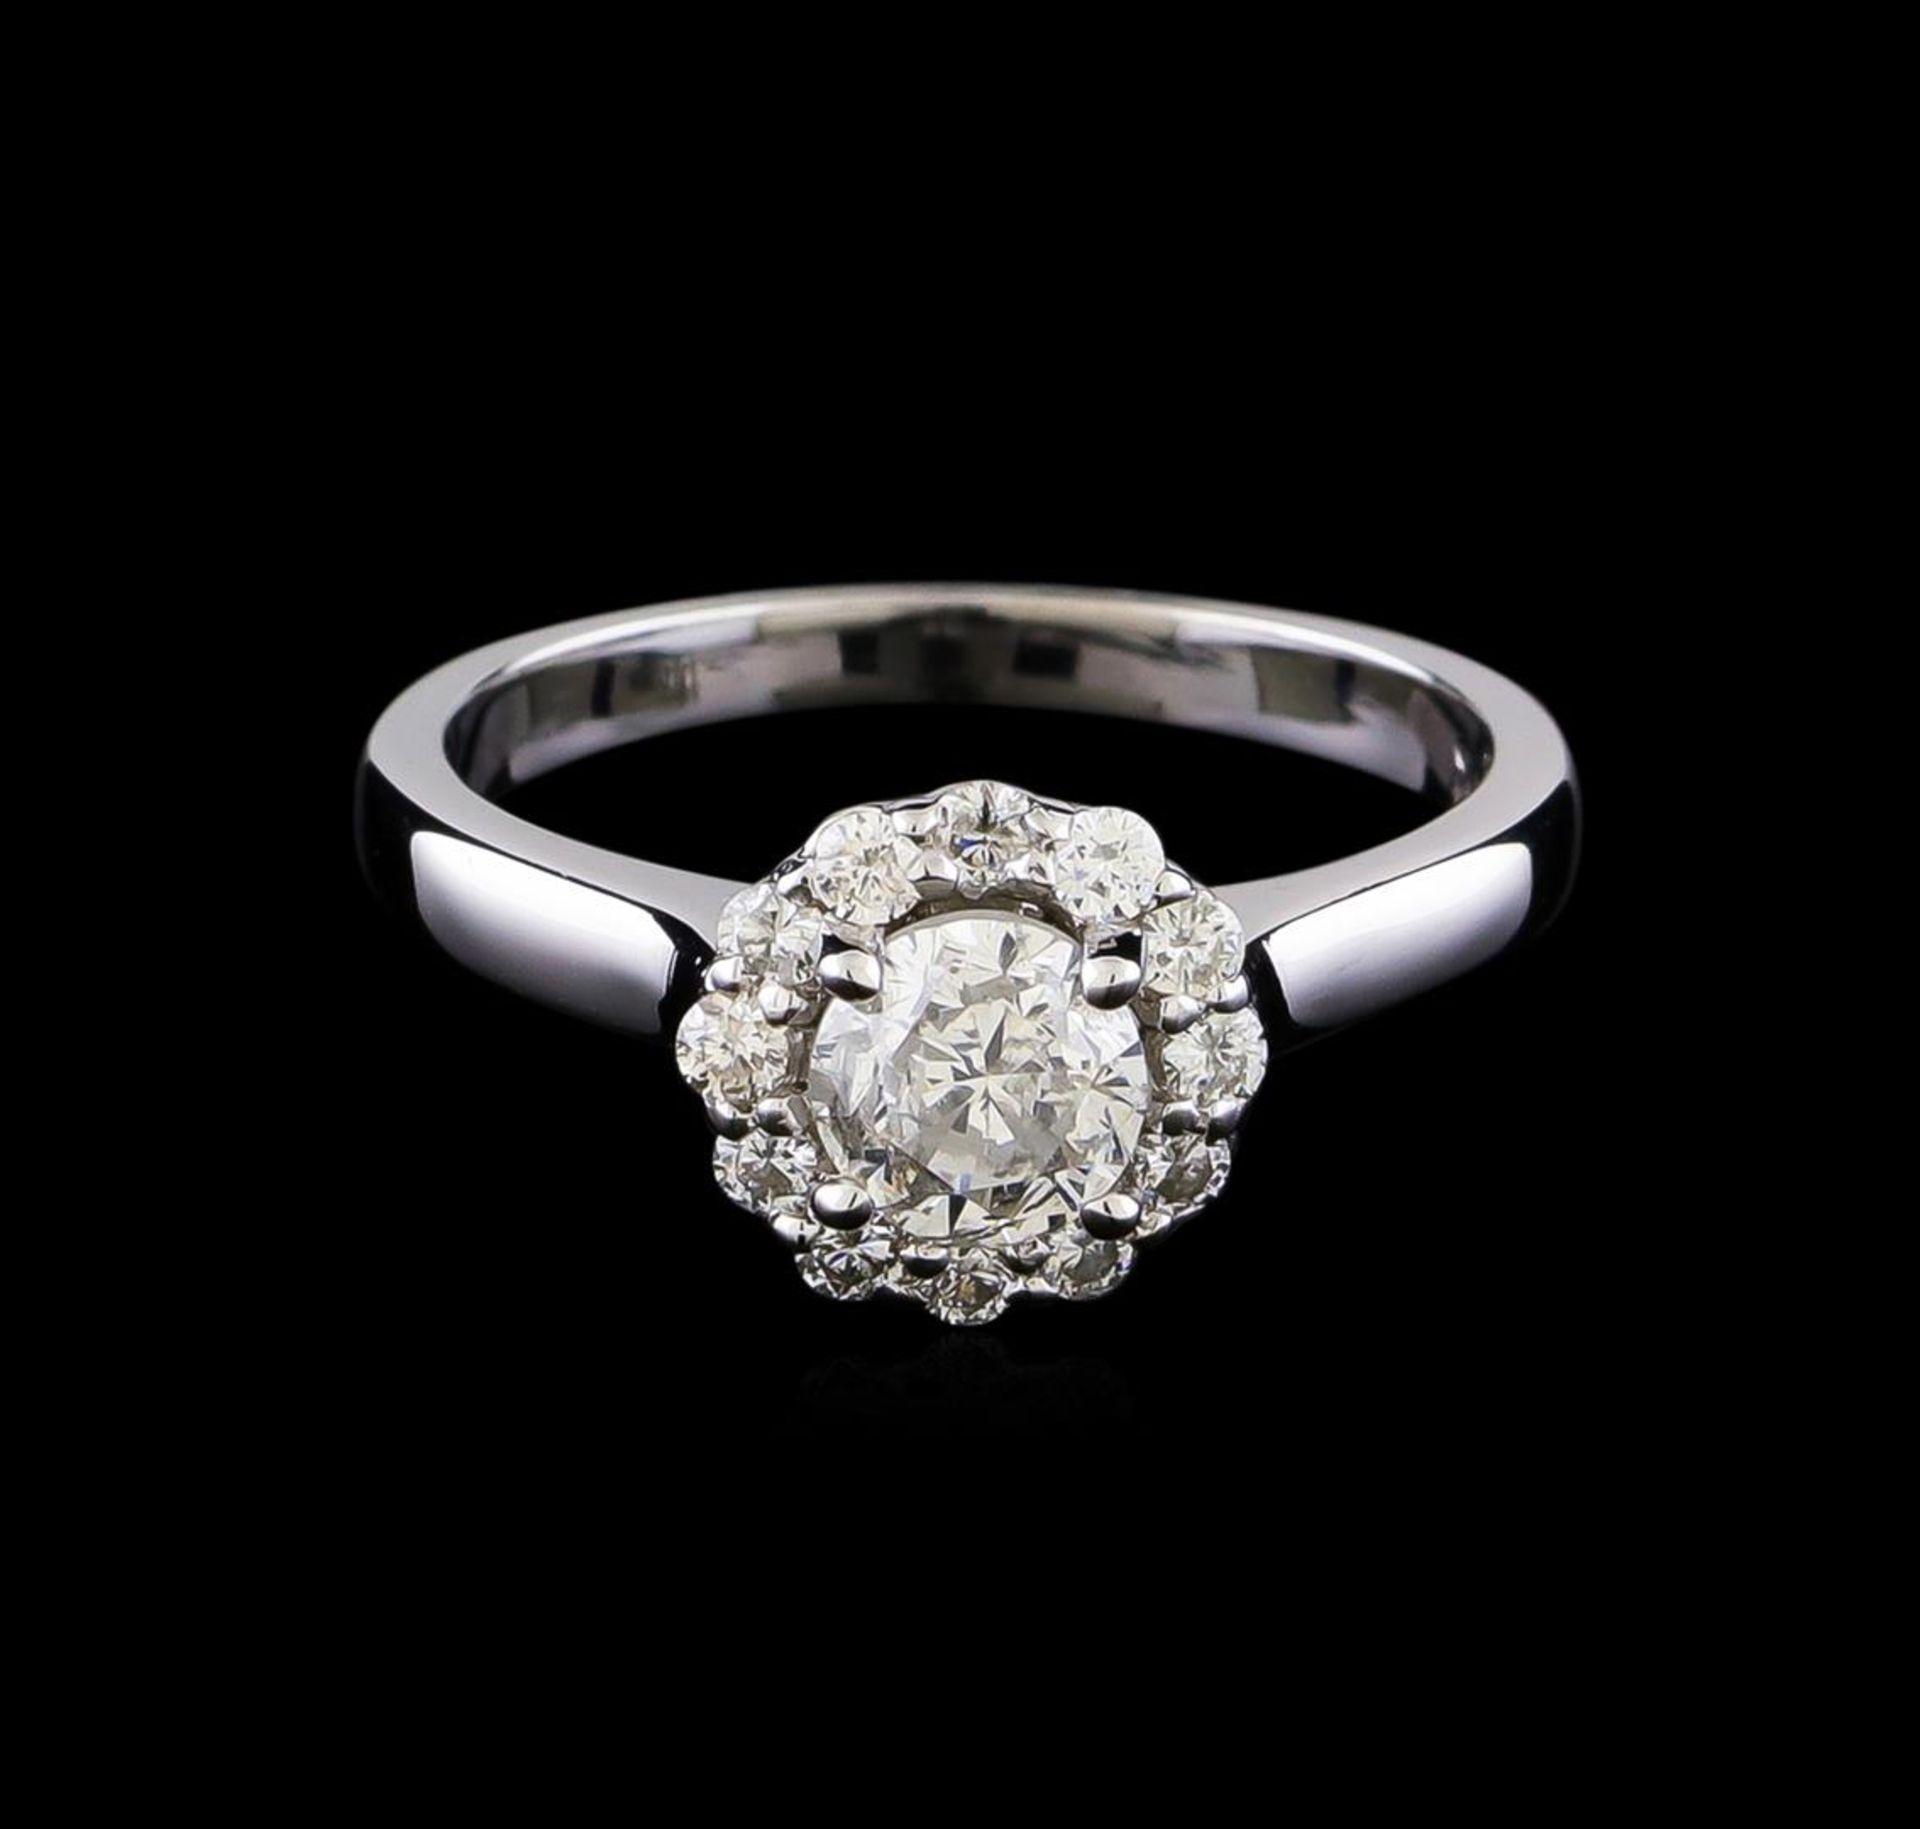 0.99 ctw Diamond Ring - 14KT White Gold - Image 2 of 5